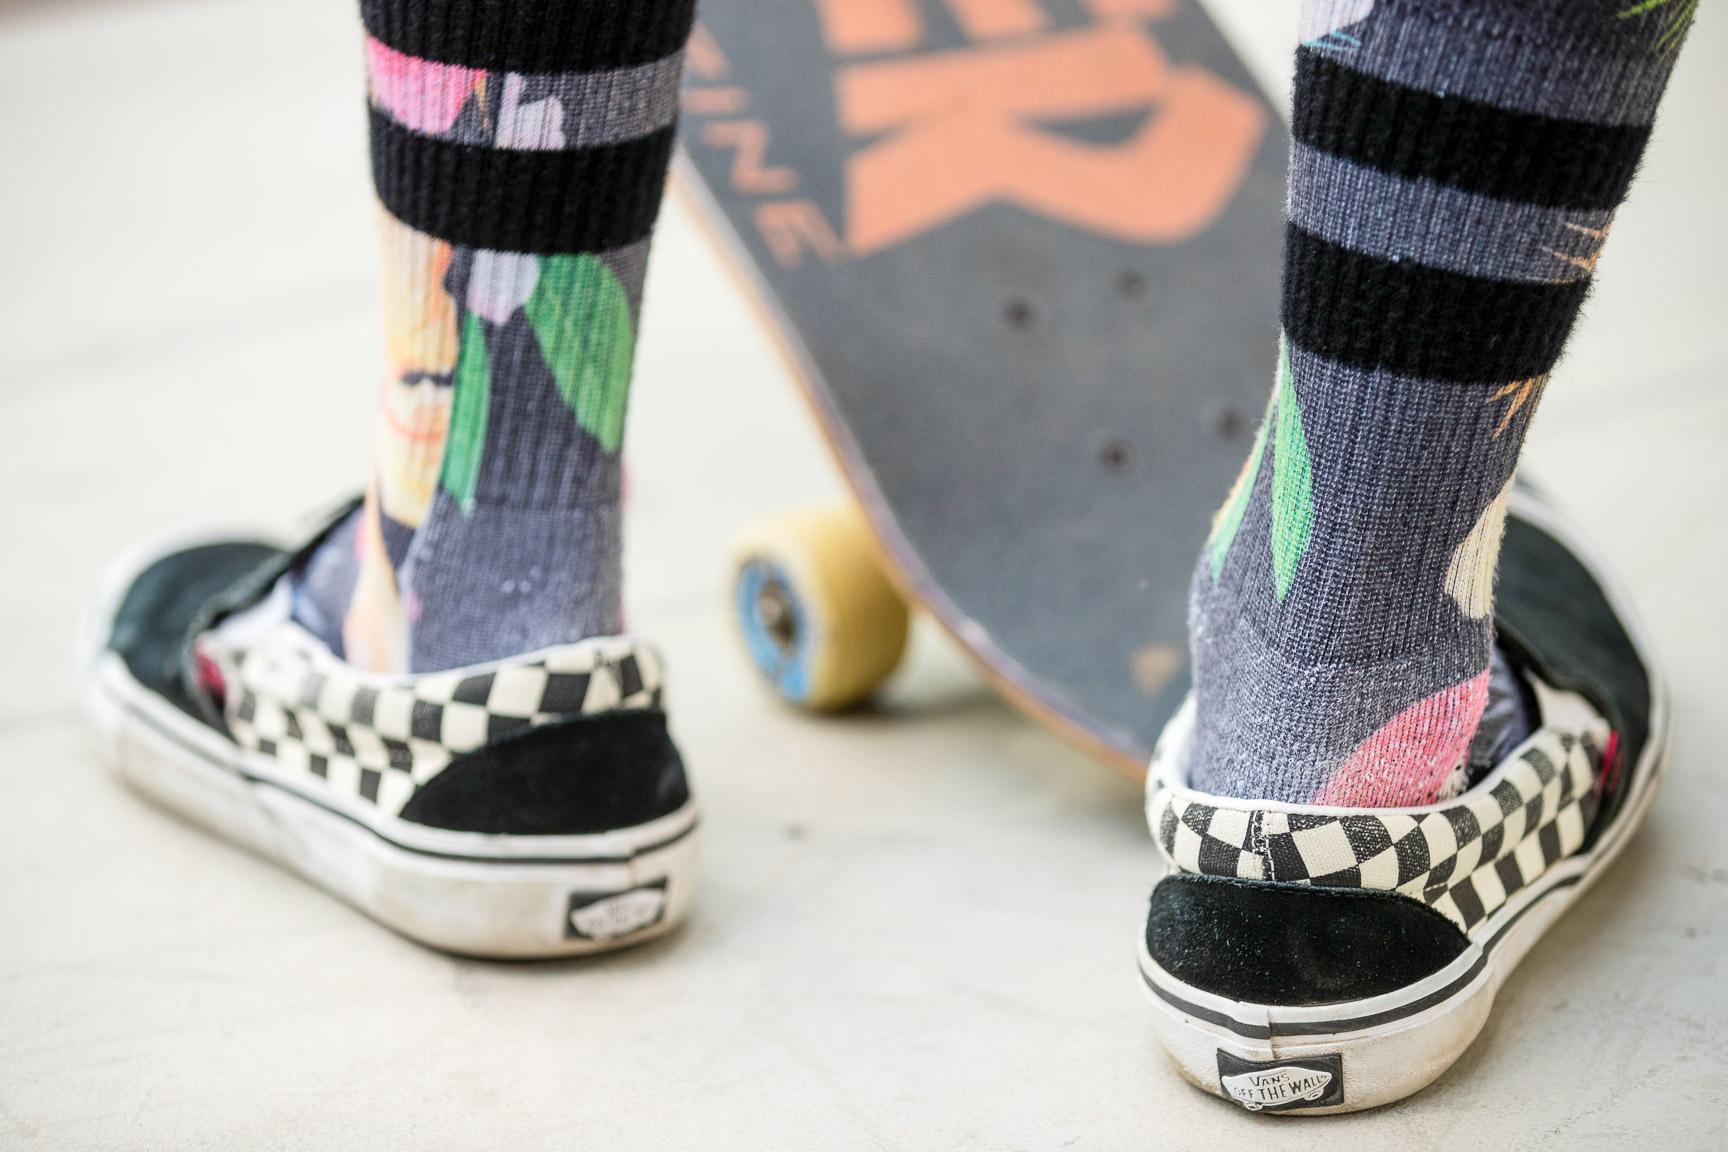 Shoe sponsors